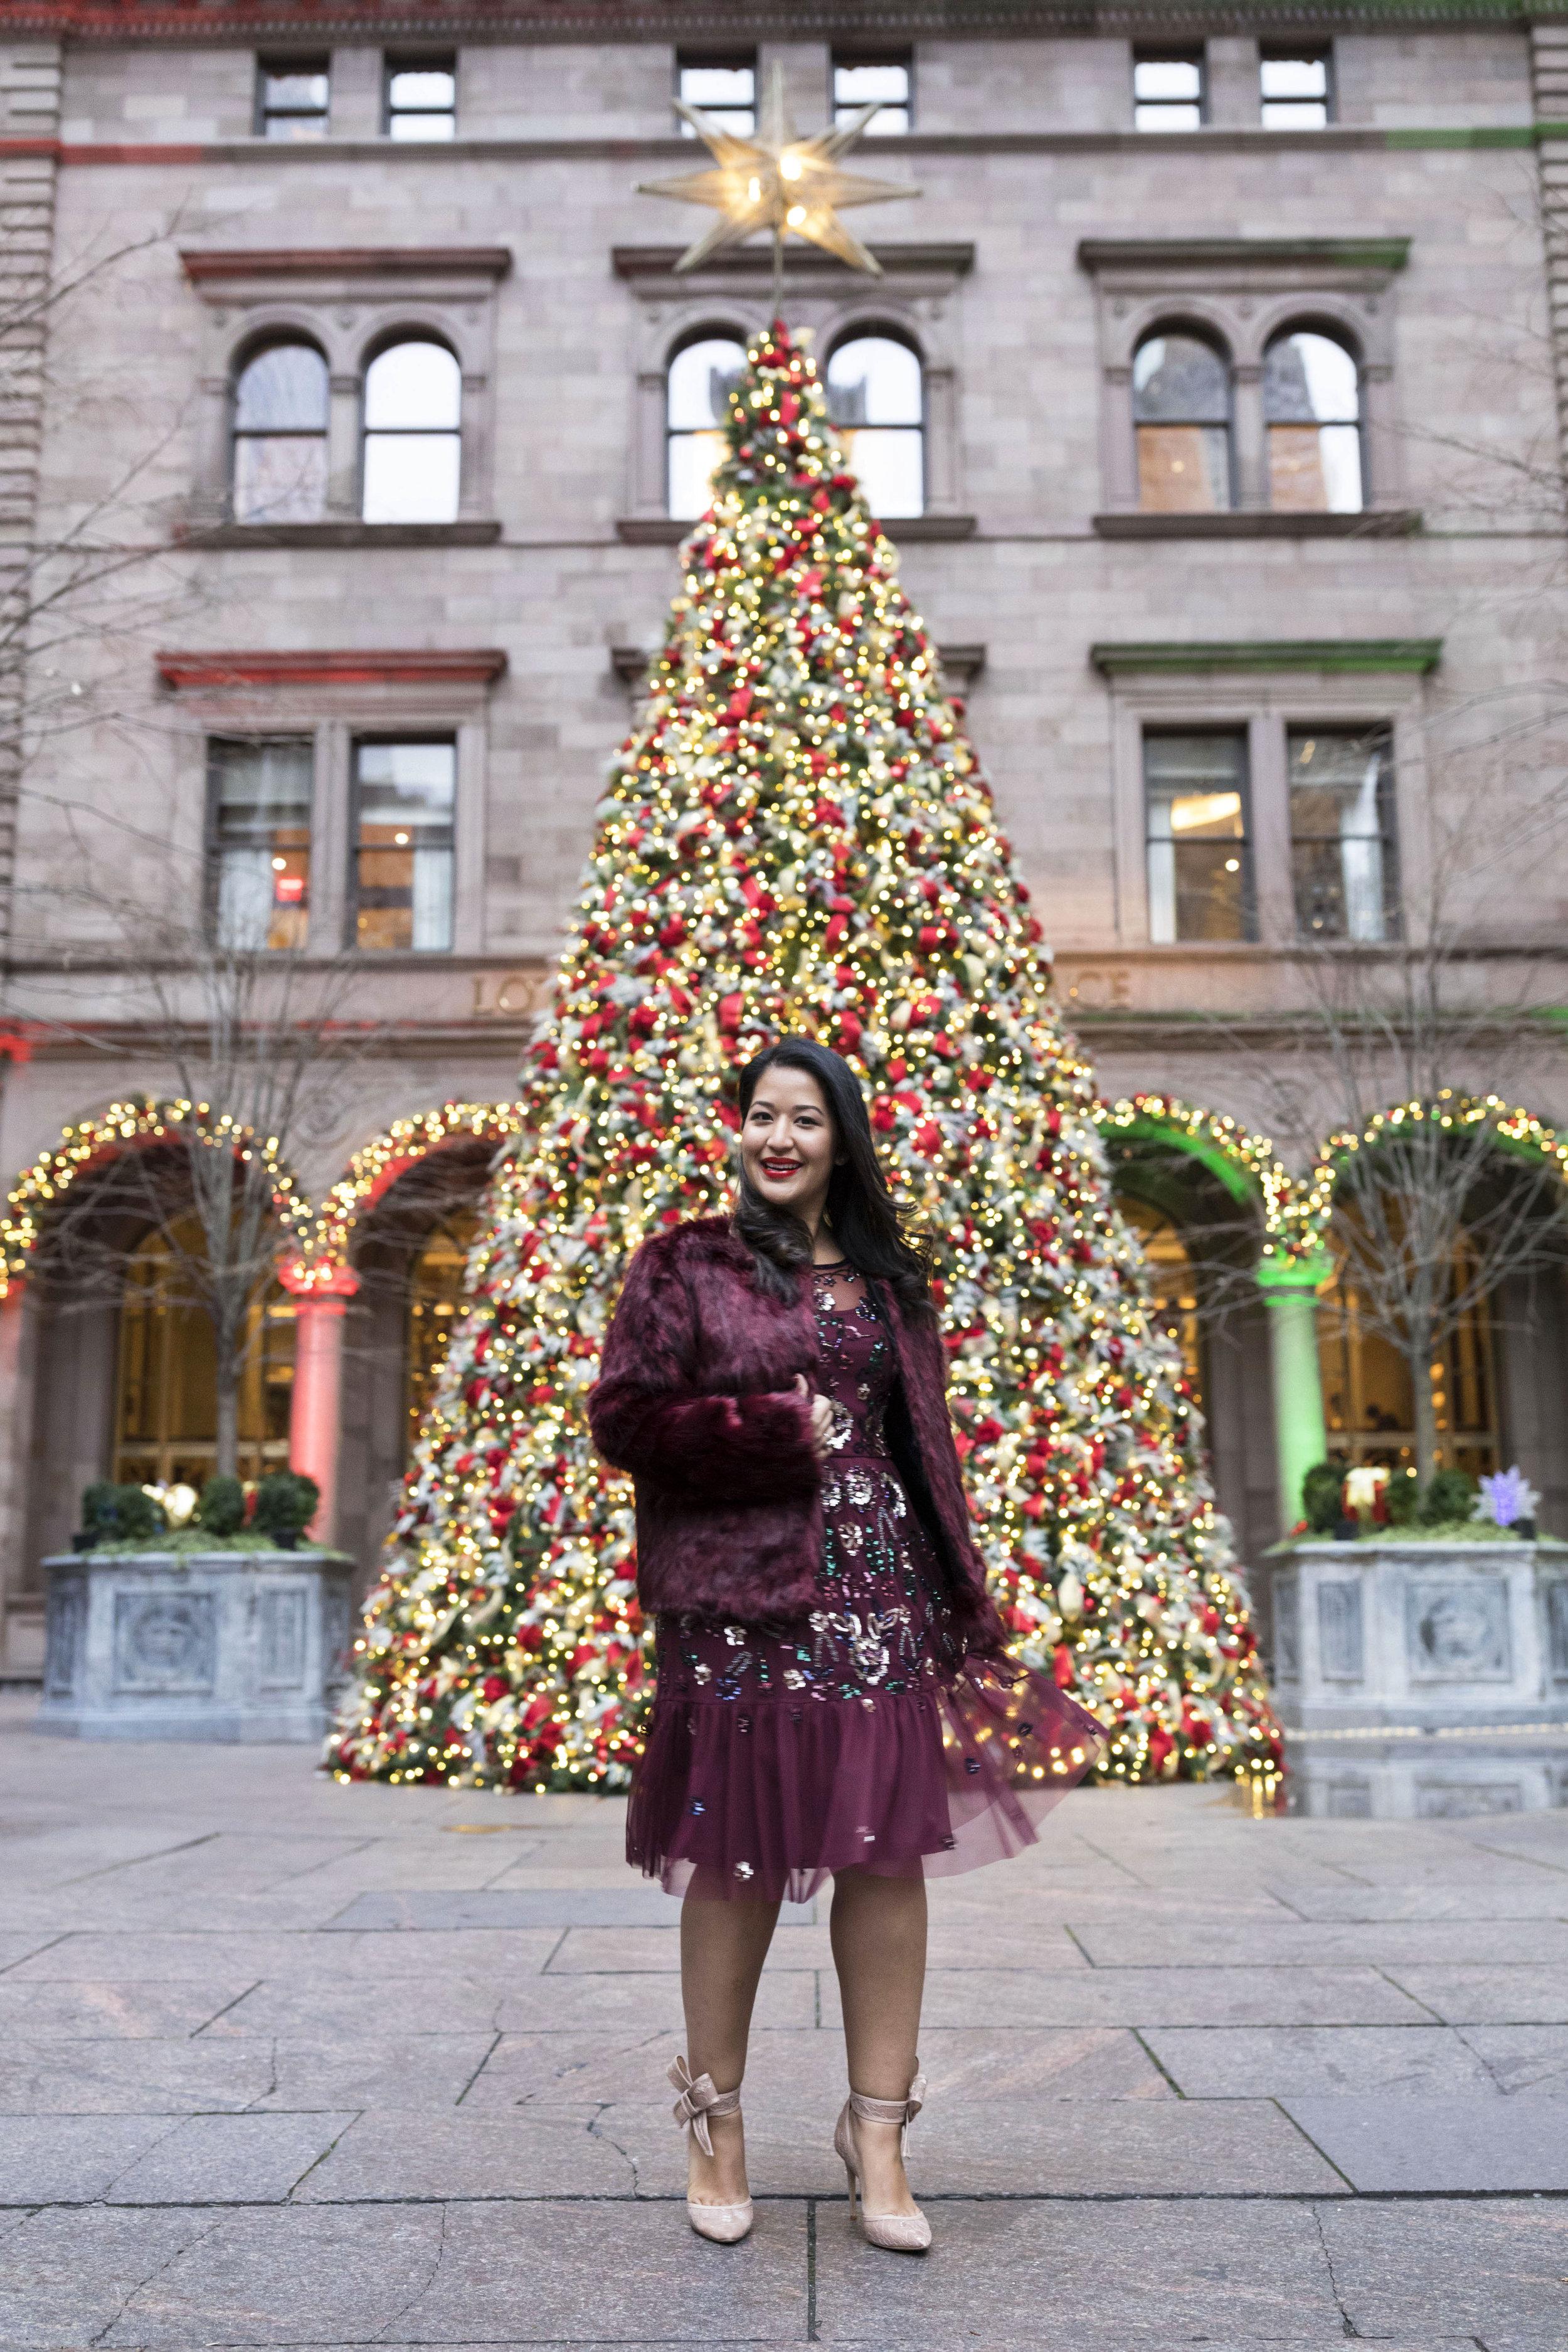 Krity S x Holiday Outfit x Aidan Beaded Burgundy Short Dress5.jpg